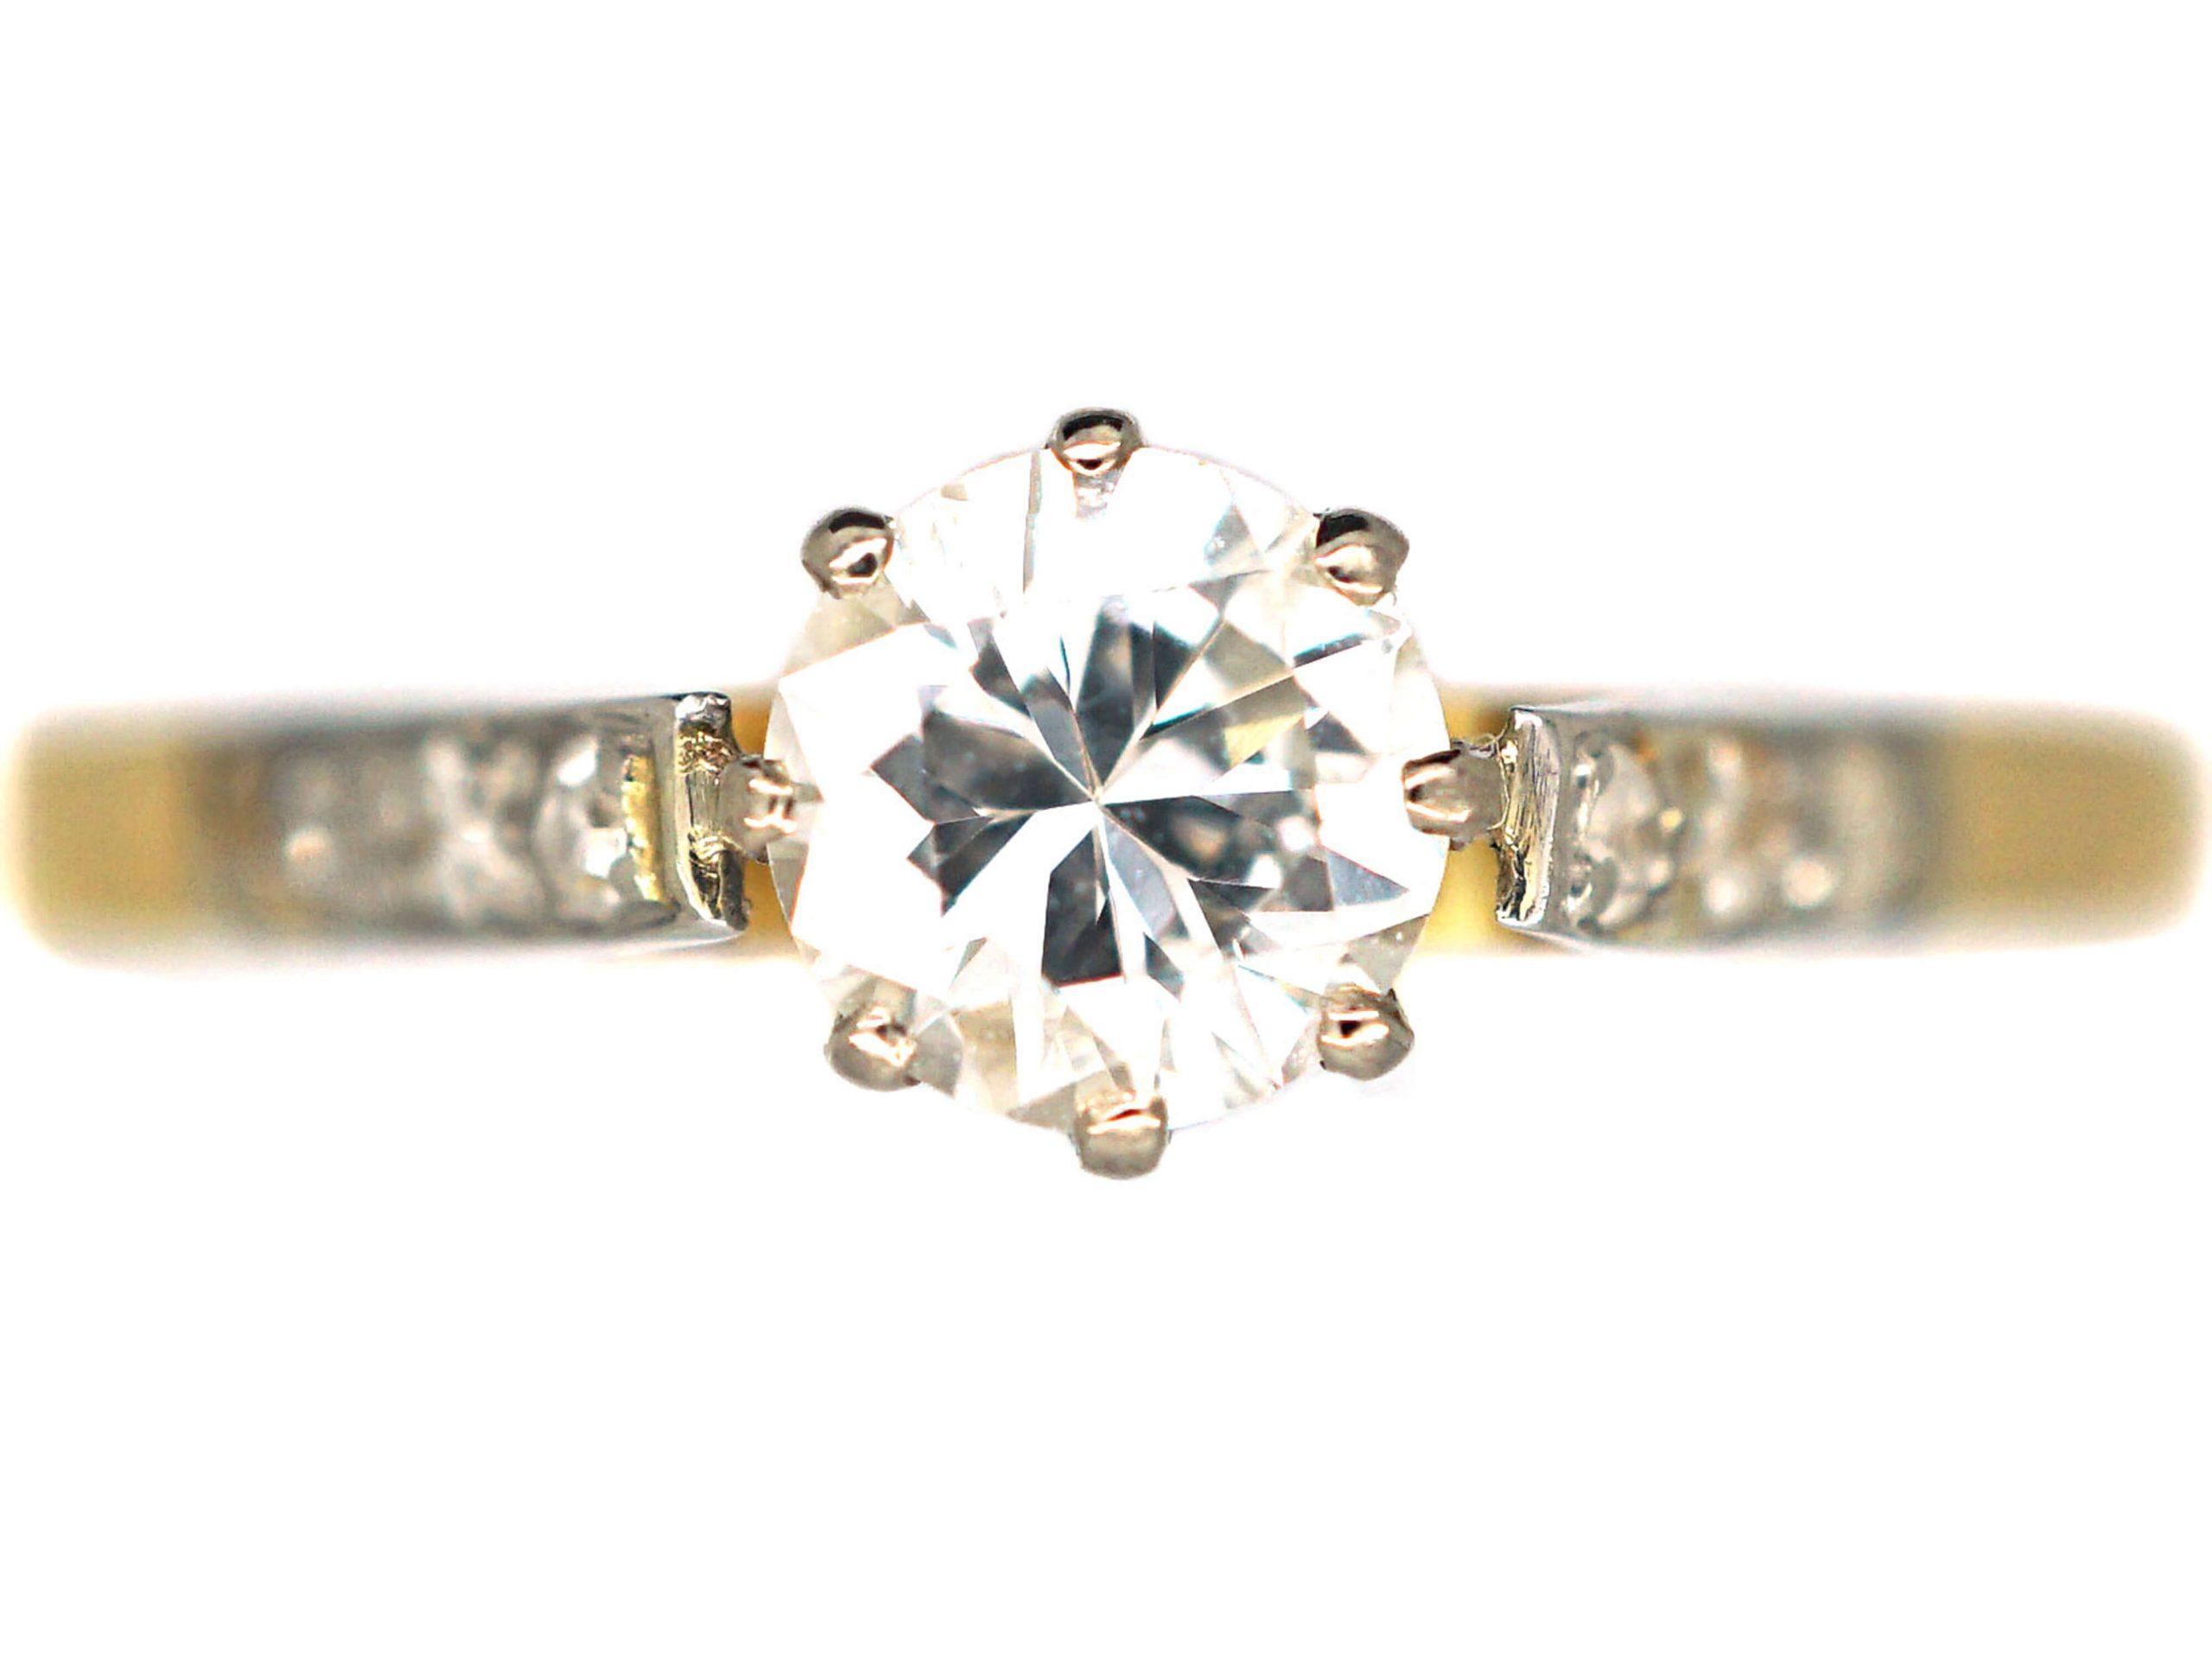 18ct Gold & Platinum, Single Stone Diamond Ring with Diamond Set Shoulders